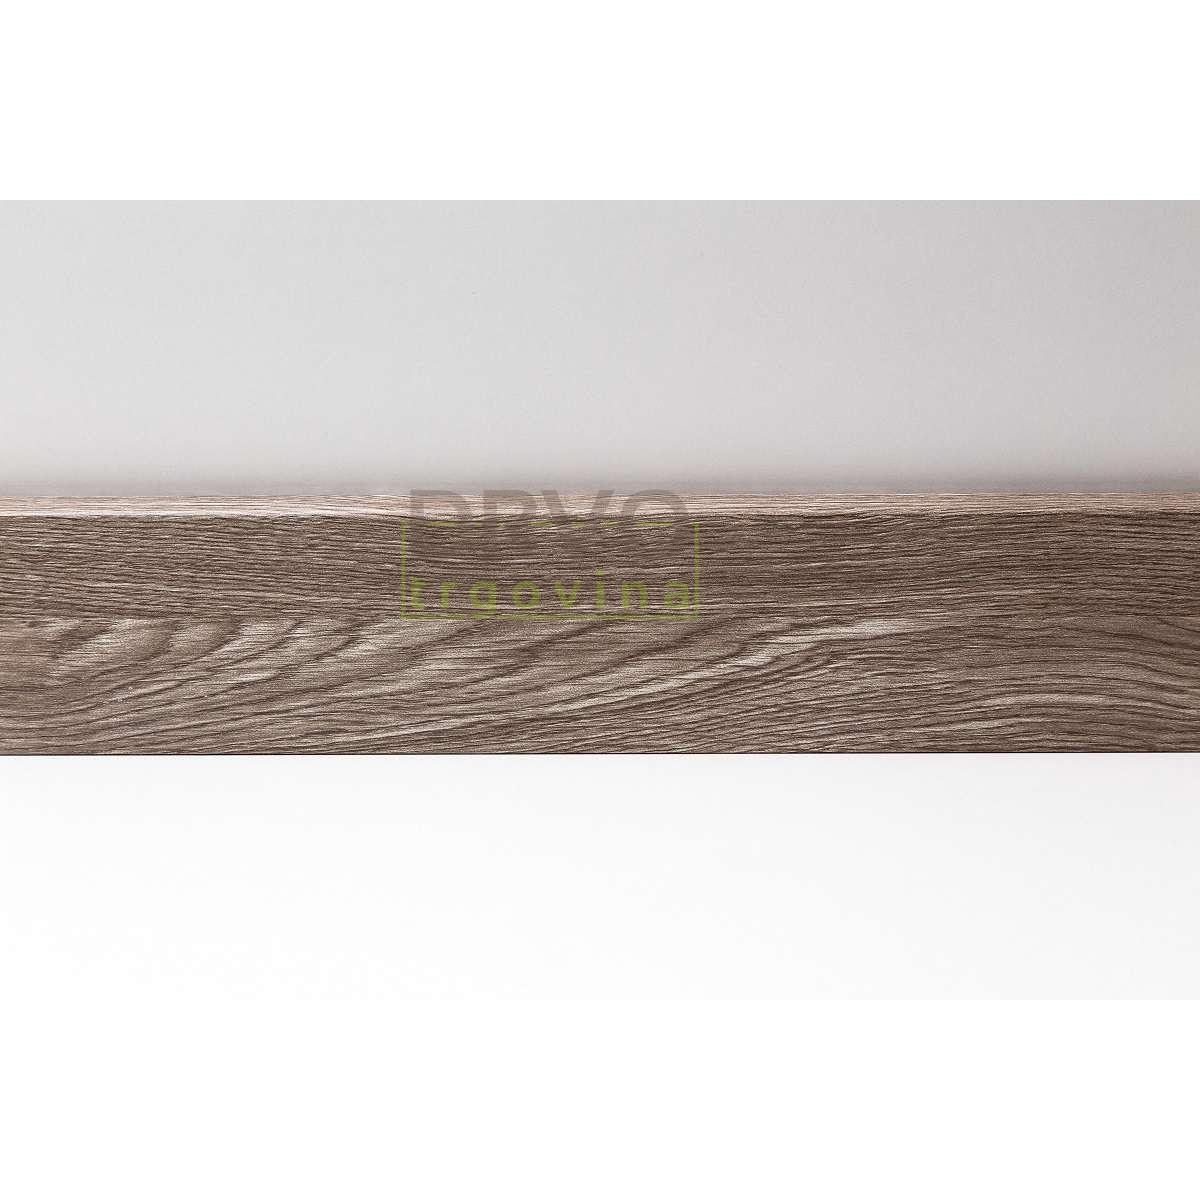 LETVICA ZA LAMINAT 70mm FOEI535 SF446L 5380/3749/4279/K037/K399 2,4m